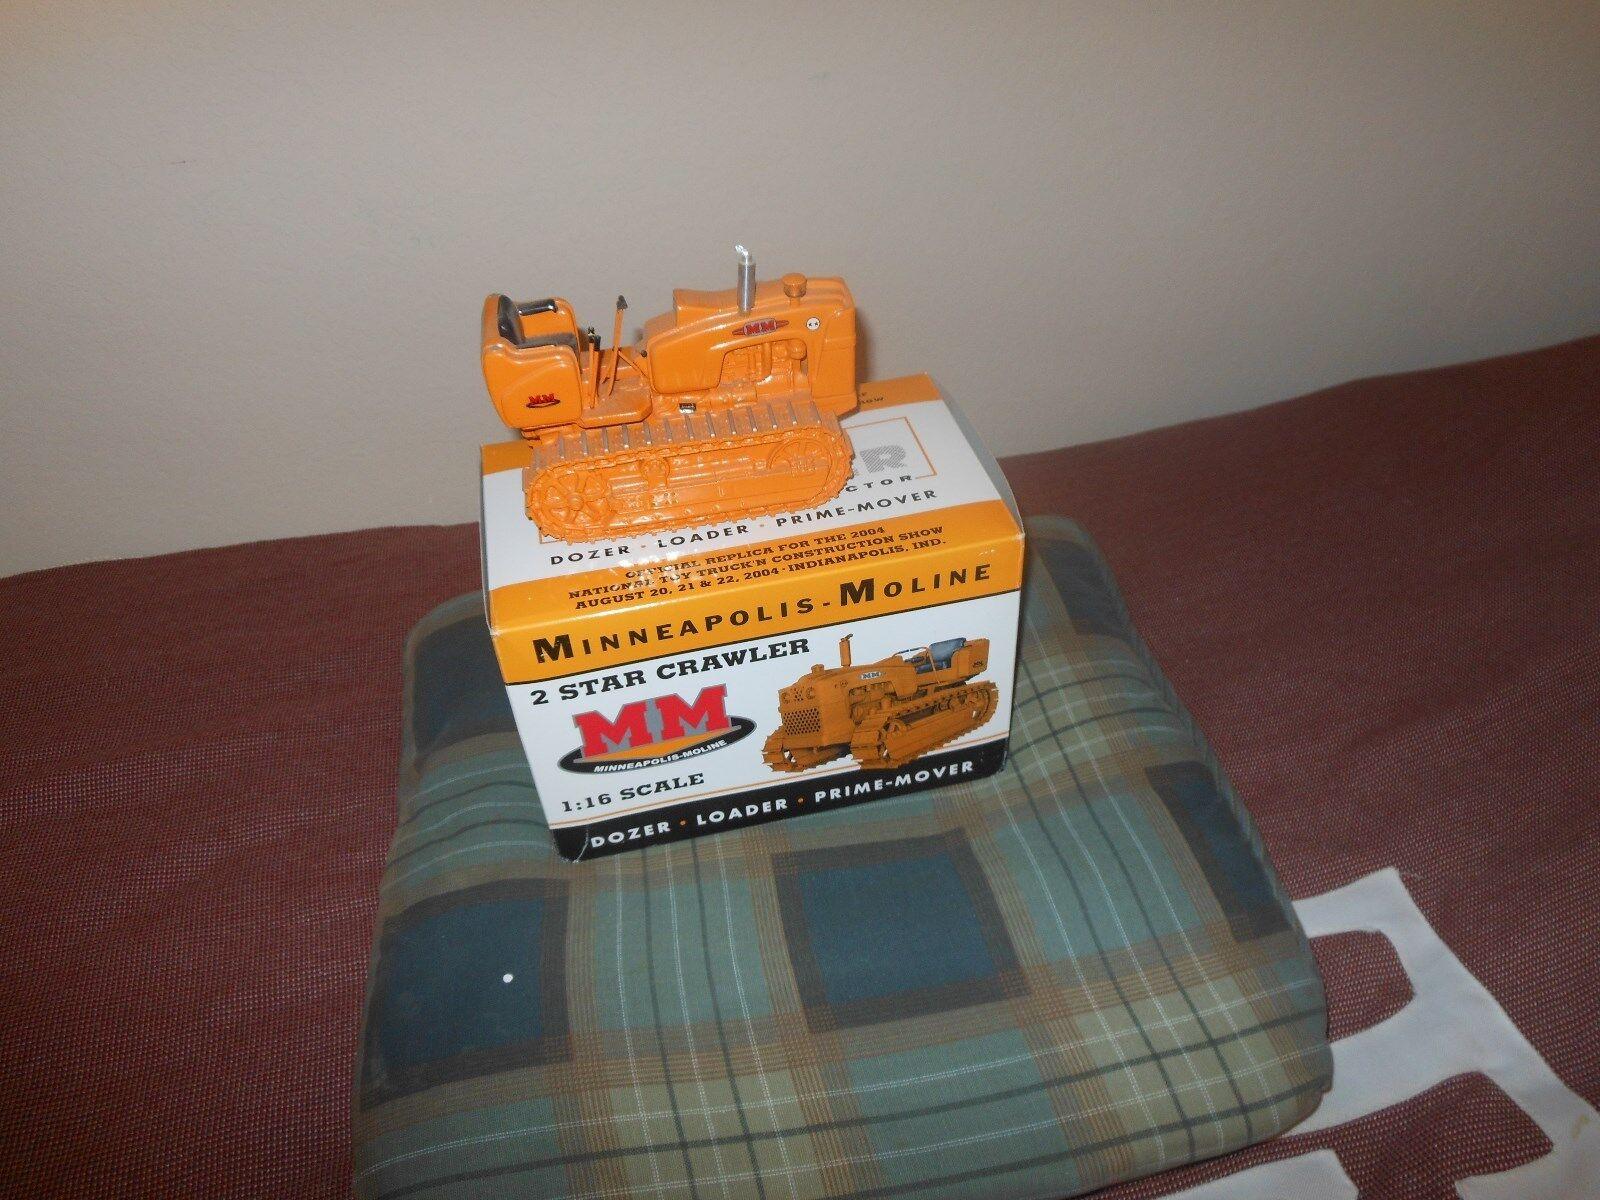 Minneapolis Moline 2 star crawler tractor  bianca, Oliver  1/16 Nuovo in box